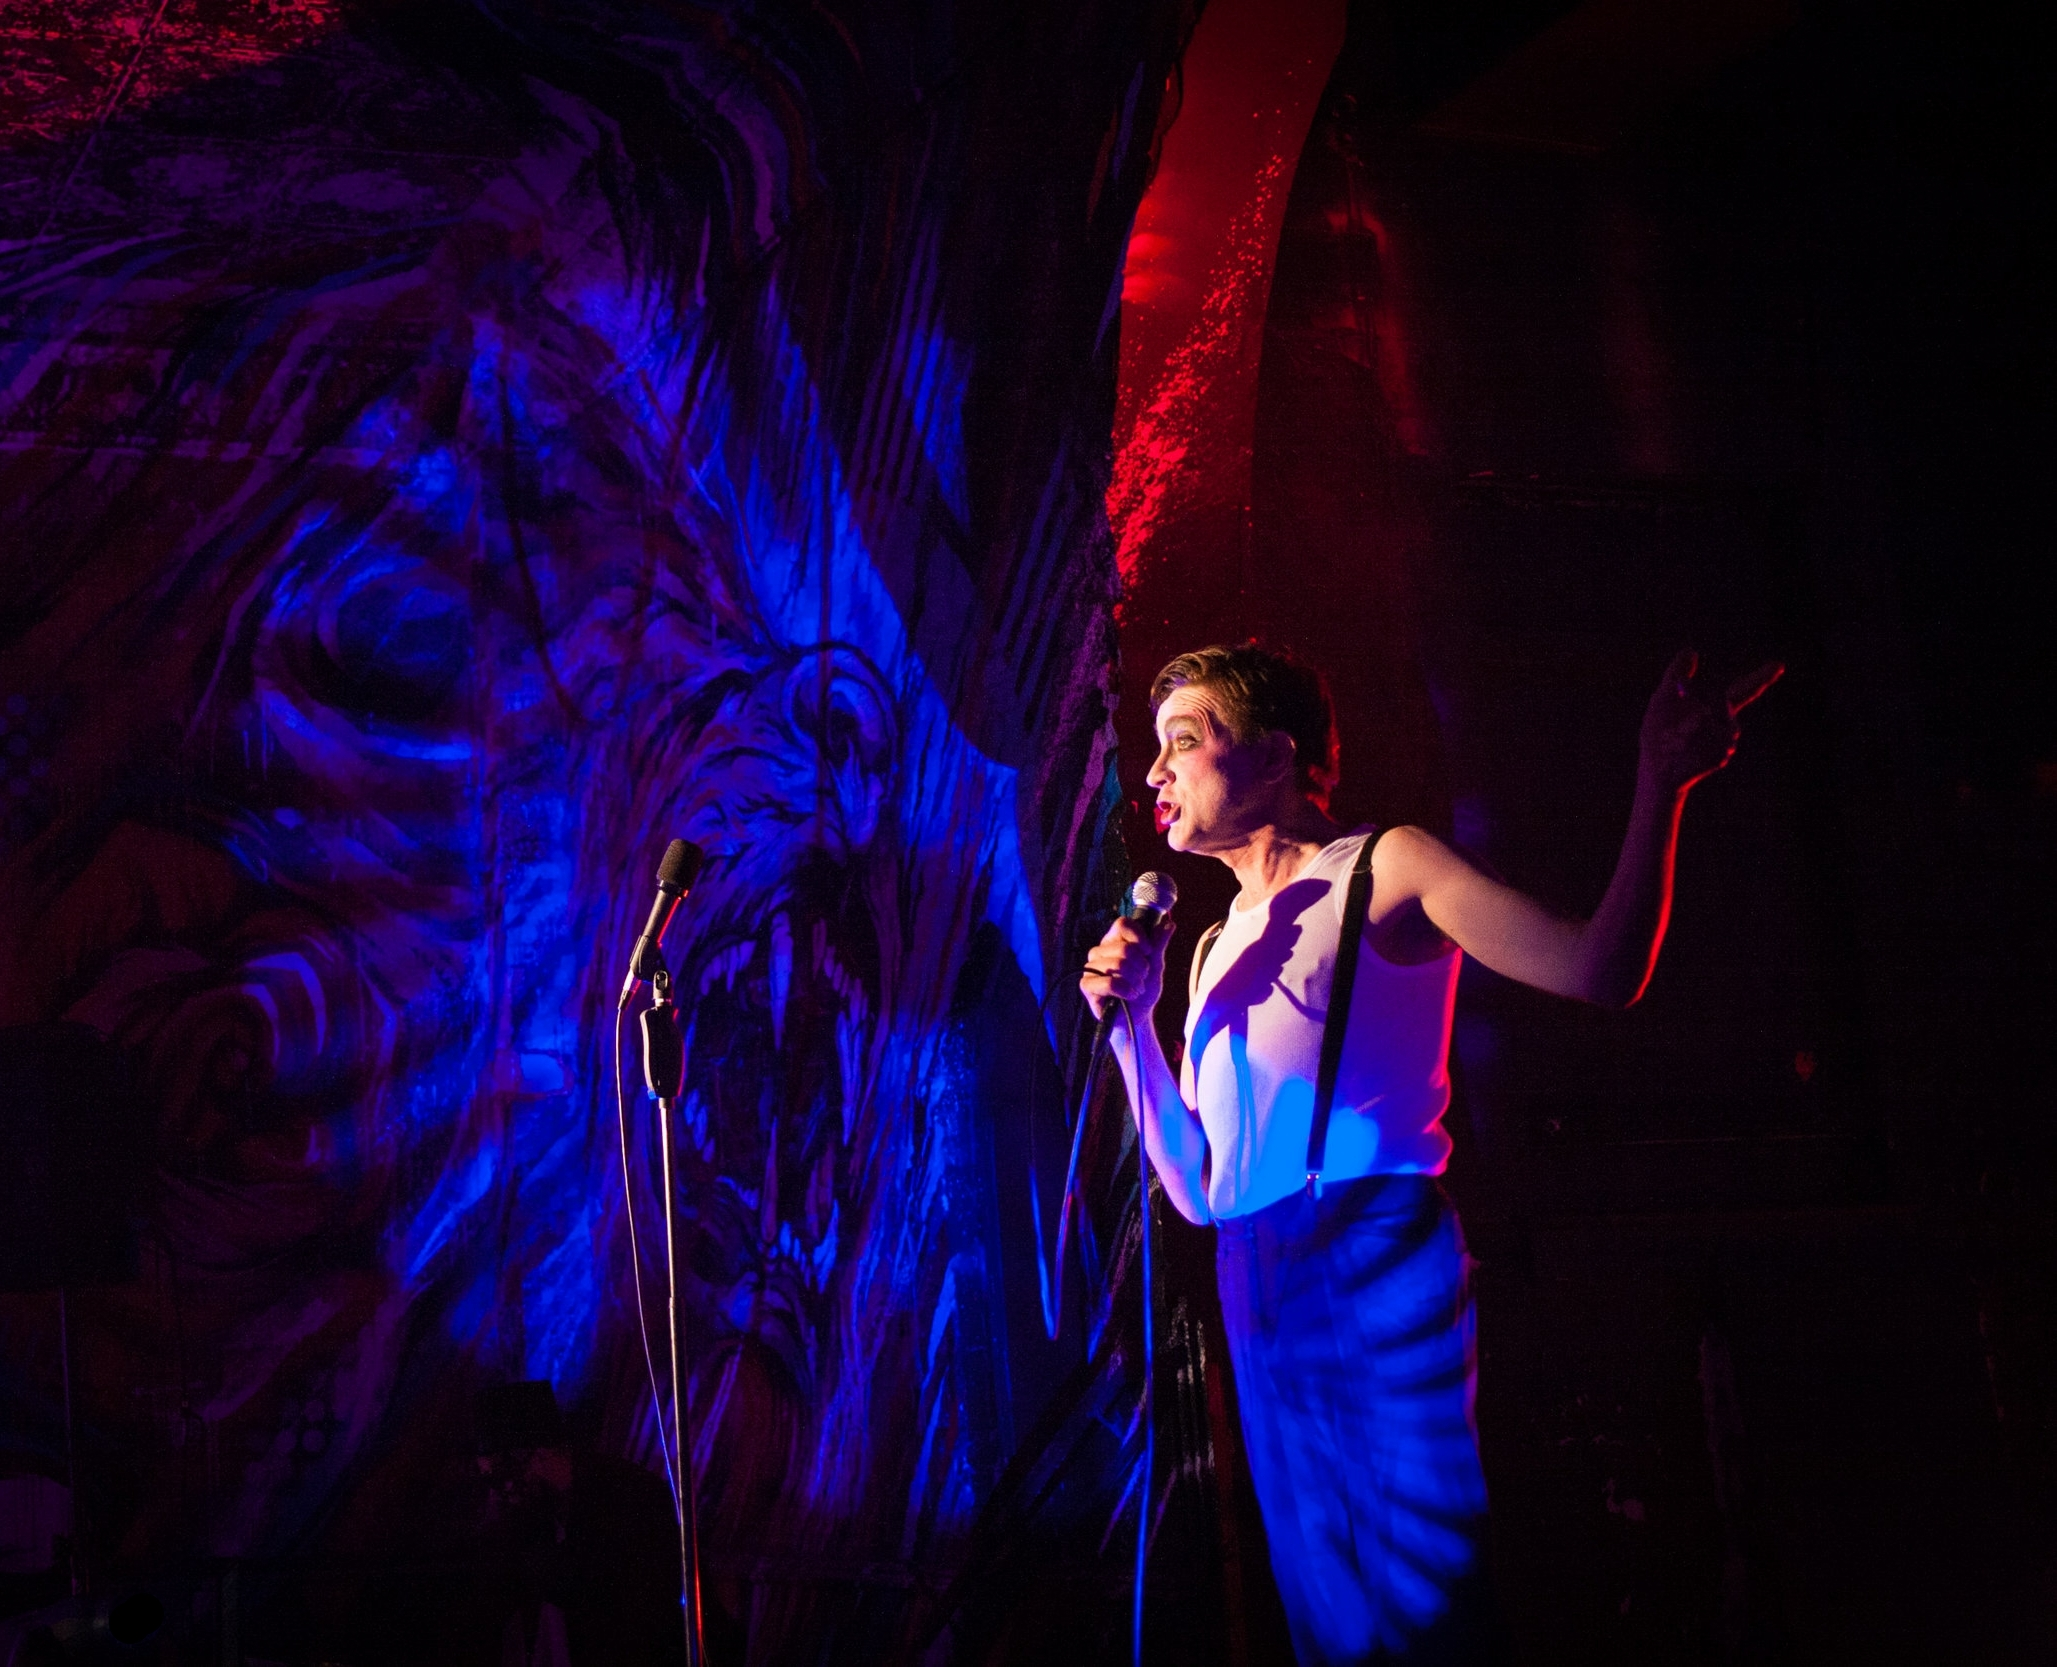 cudc-immersivecabaret-73.jpg